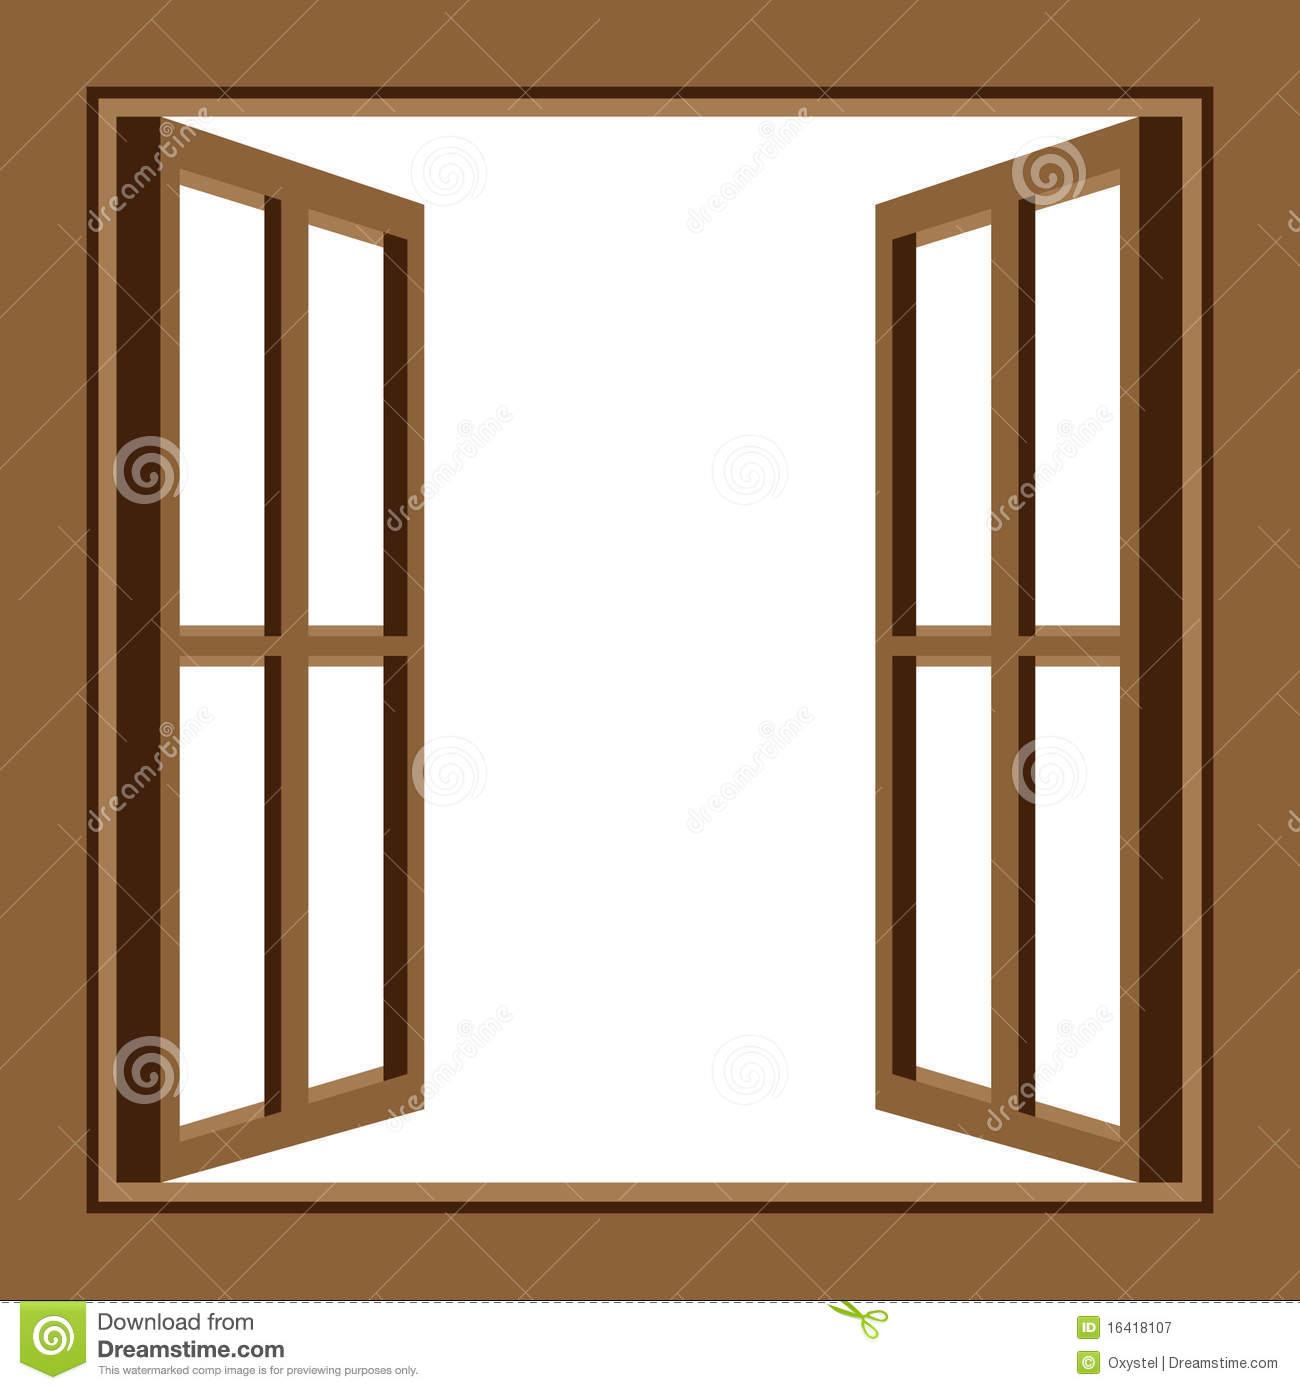 Window clipart open